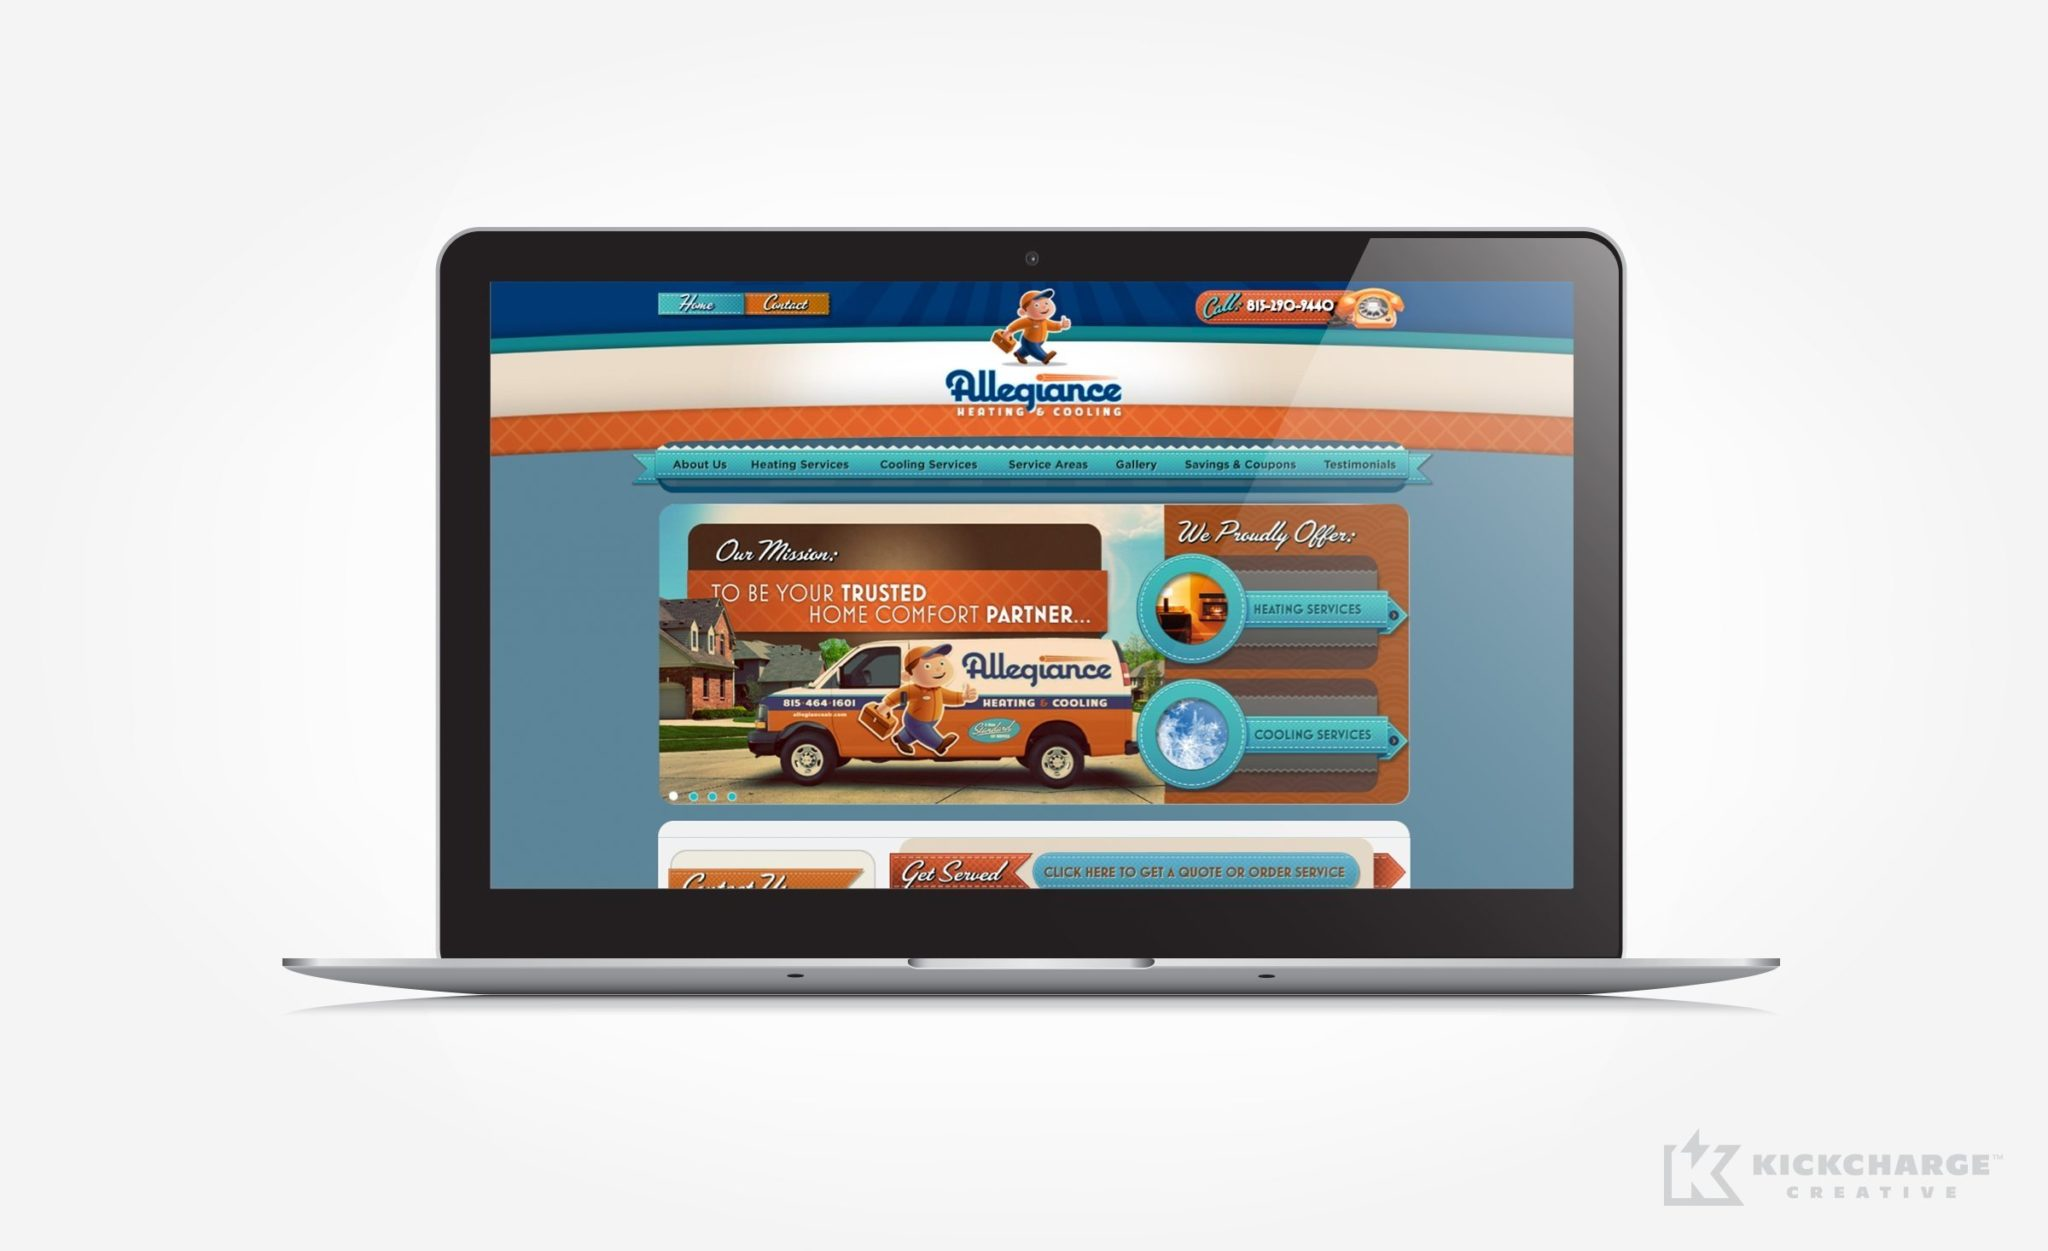 Website design and development for Allegiance.